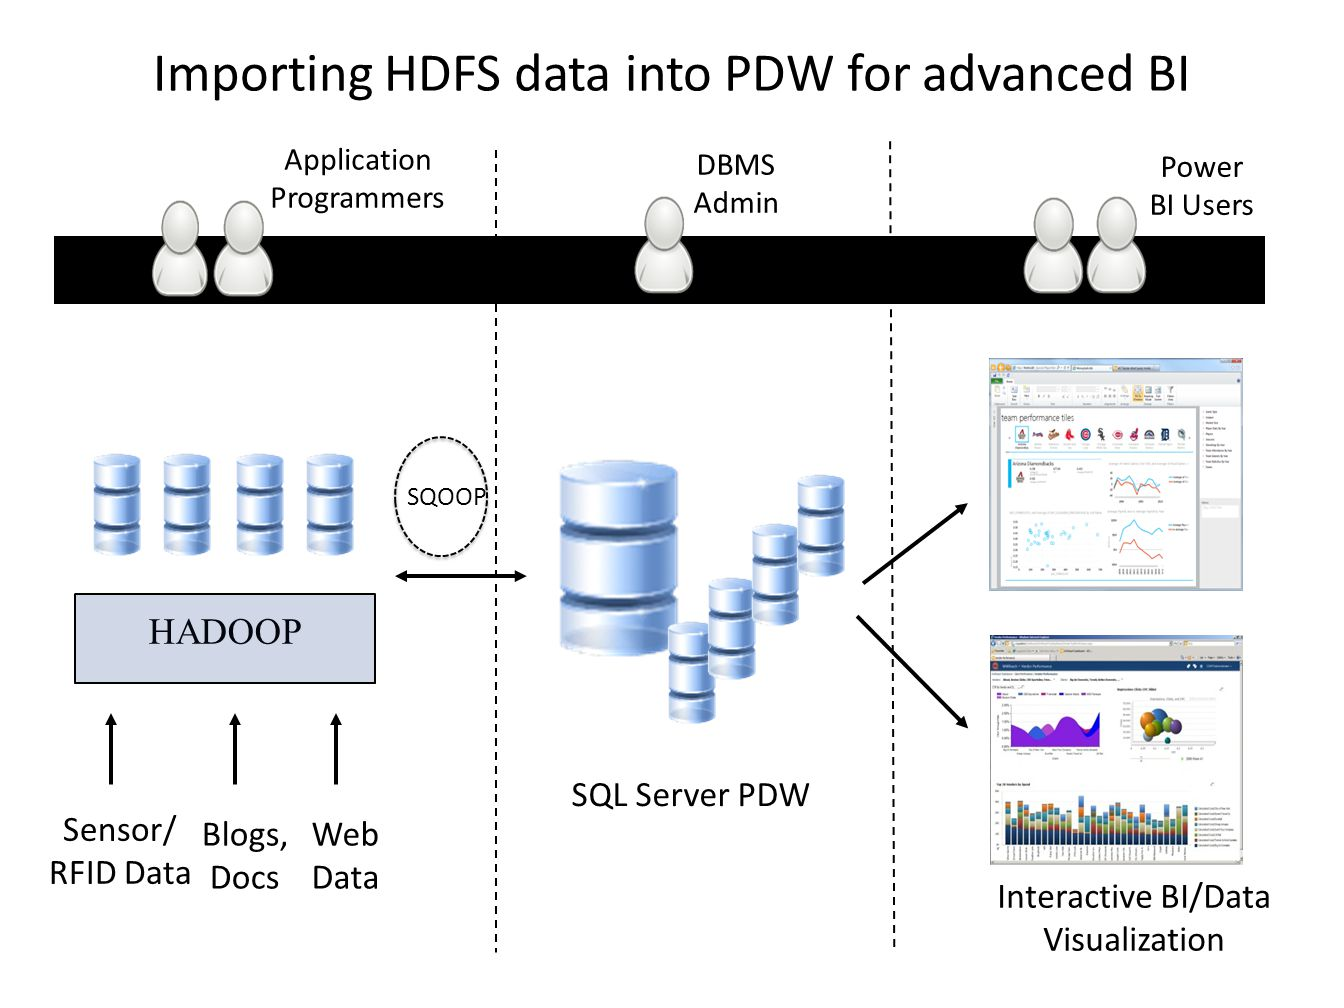 Importing HDFS data into PDW for advanced BI HADOOP Sensor/ RFID Data Blogs, Docs Web Data SQL Server PDW Interactive BI/Data Visualization SQOOP Application Programmers DBMS Admin Power BI Users